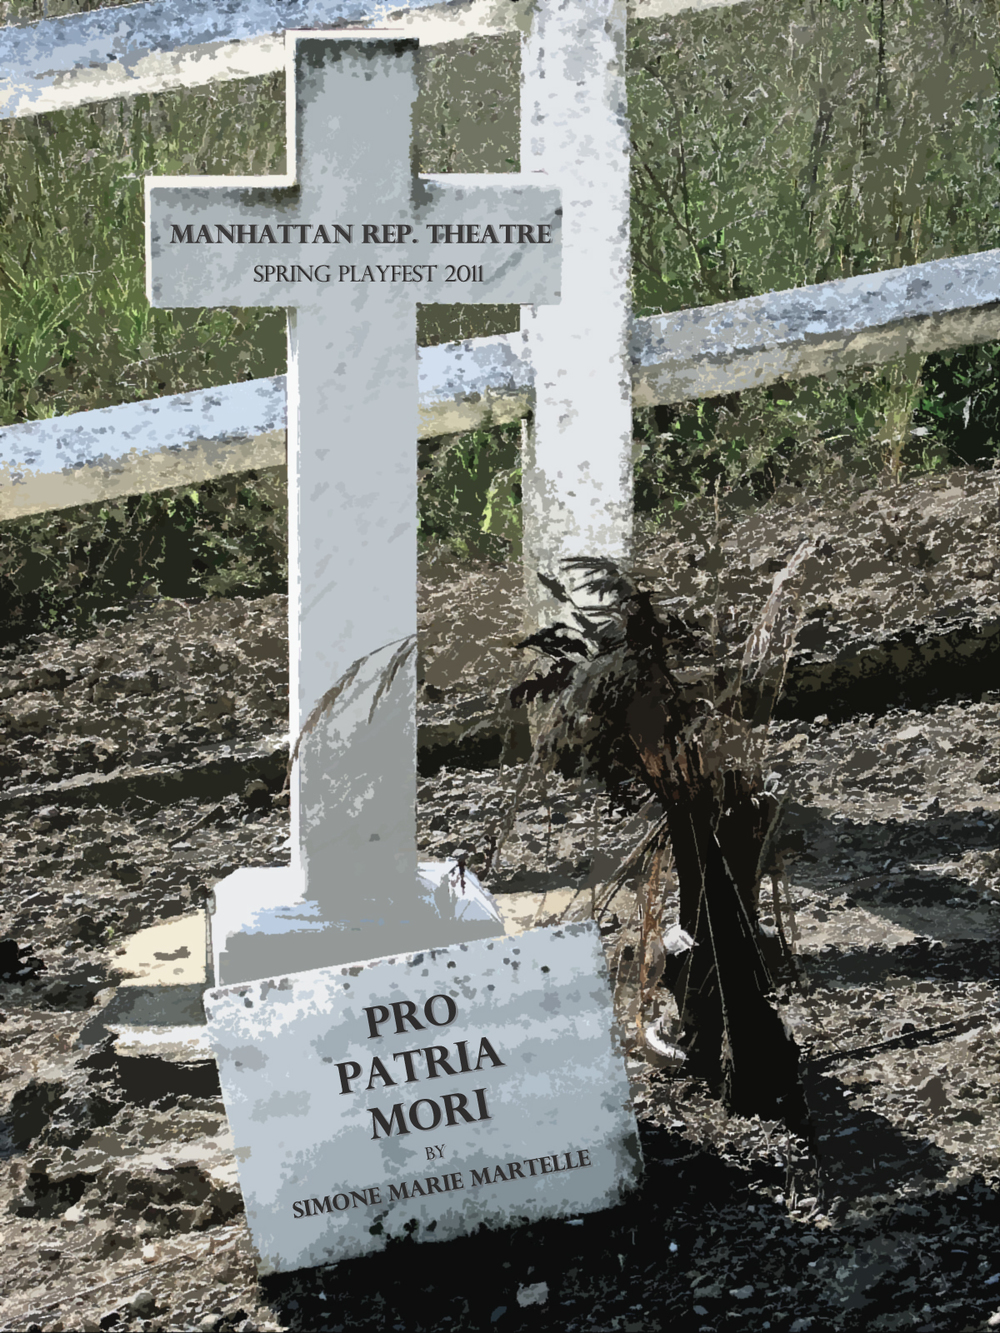 pro-patria-mori-front.jpg